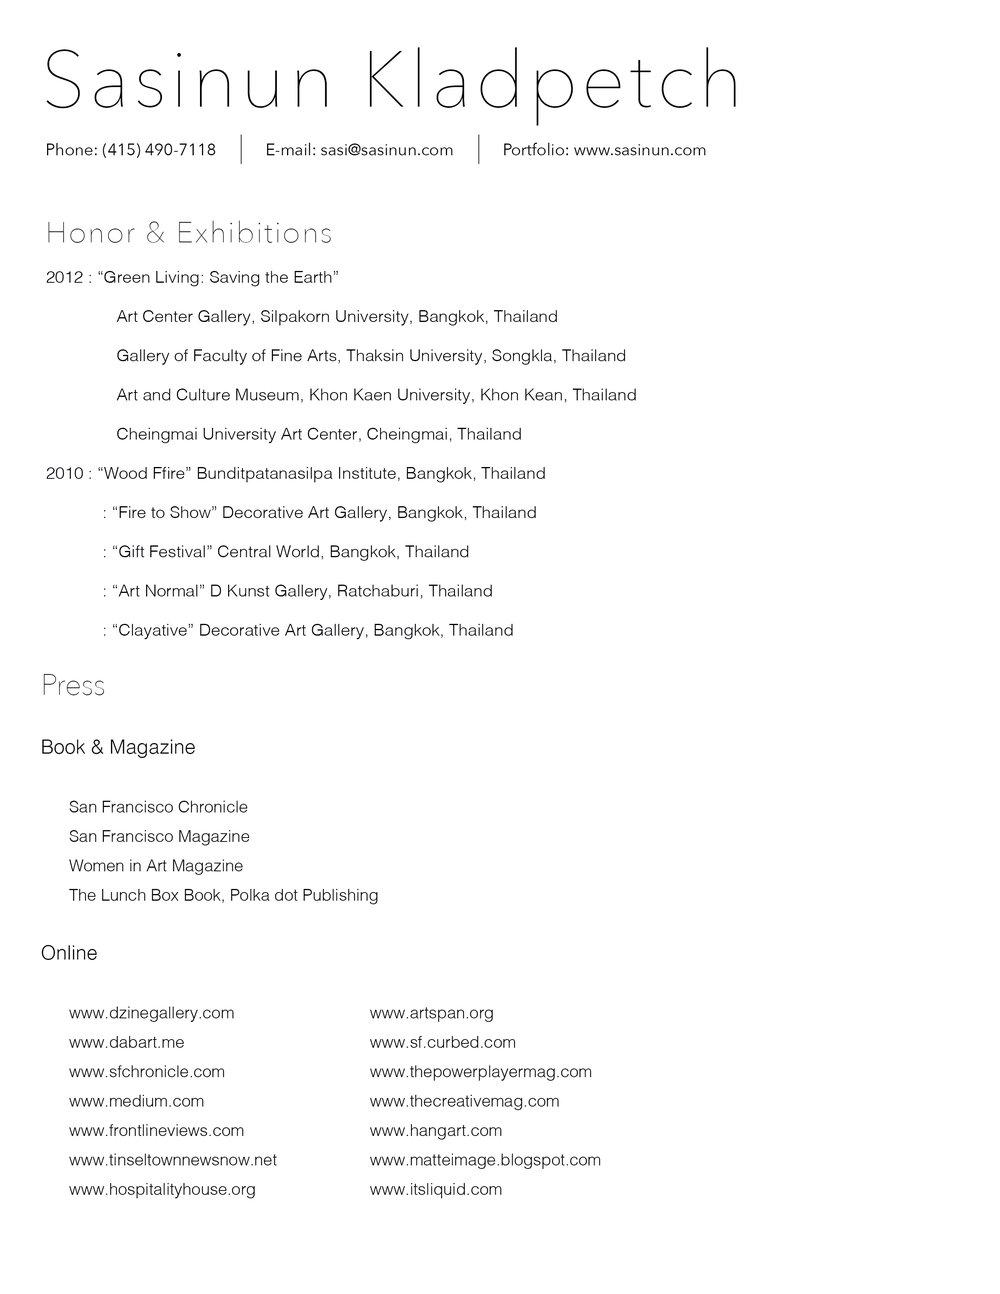 New Resume P.3.jpg